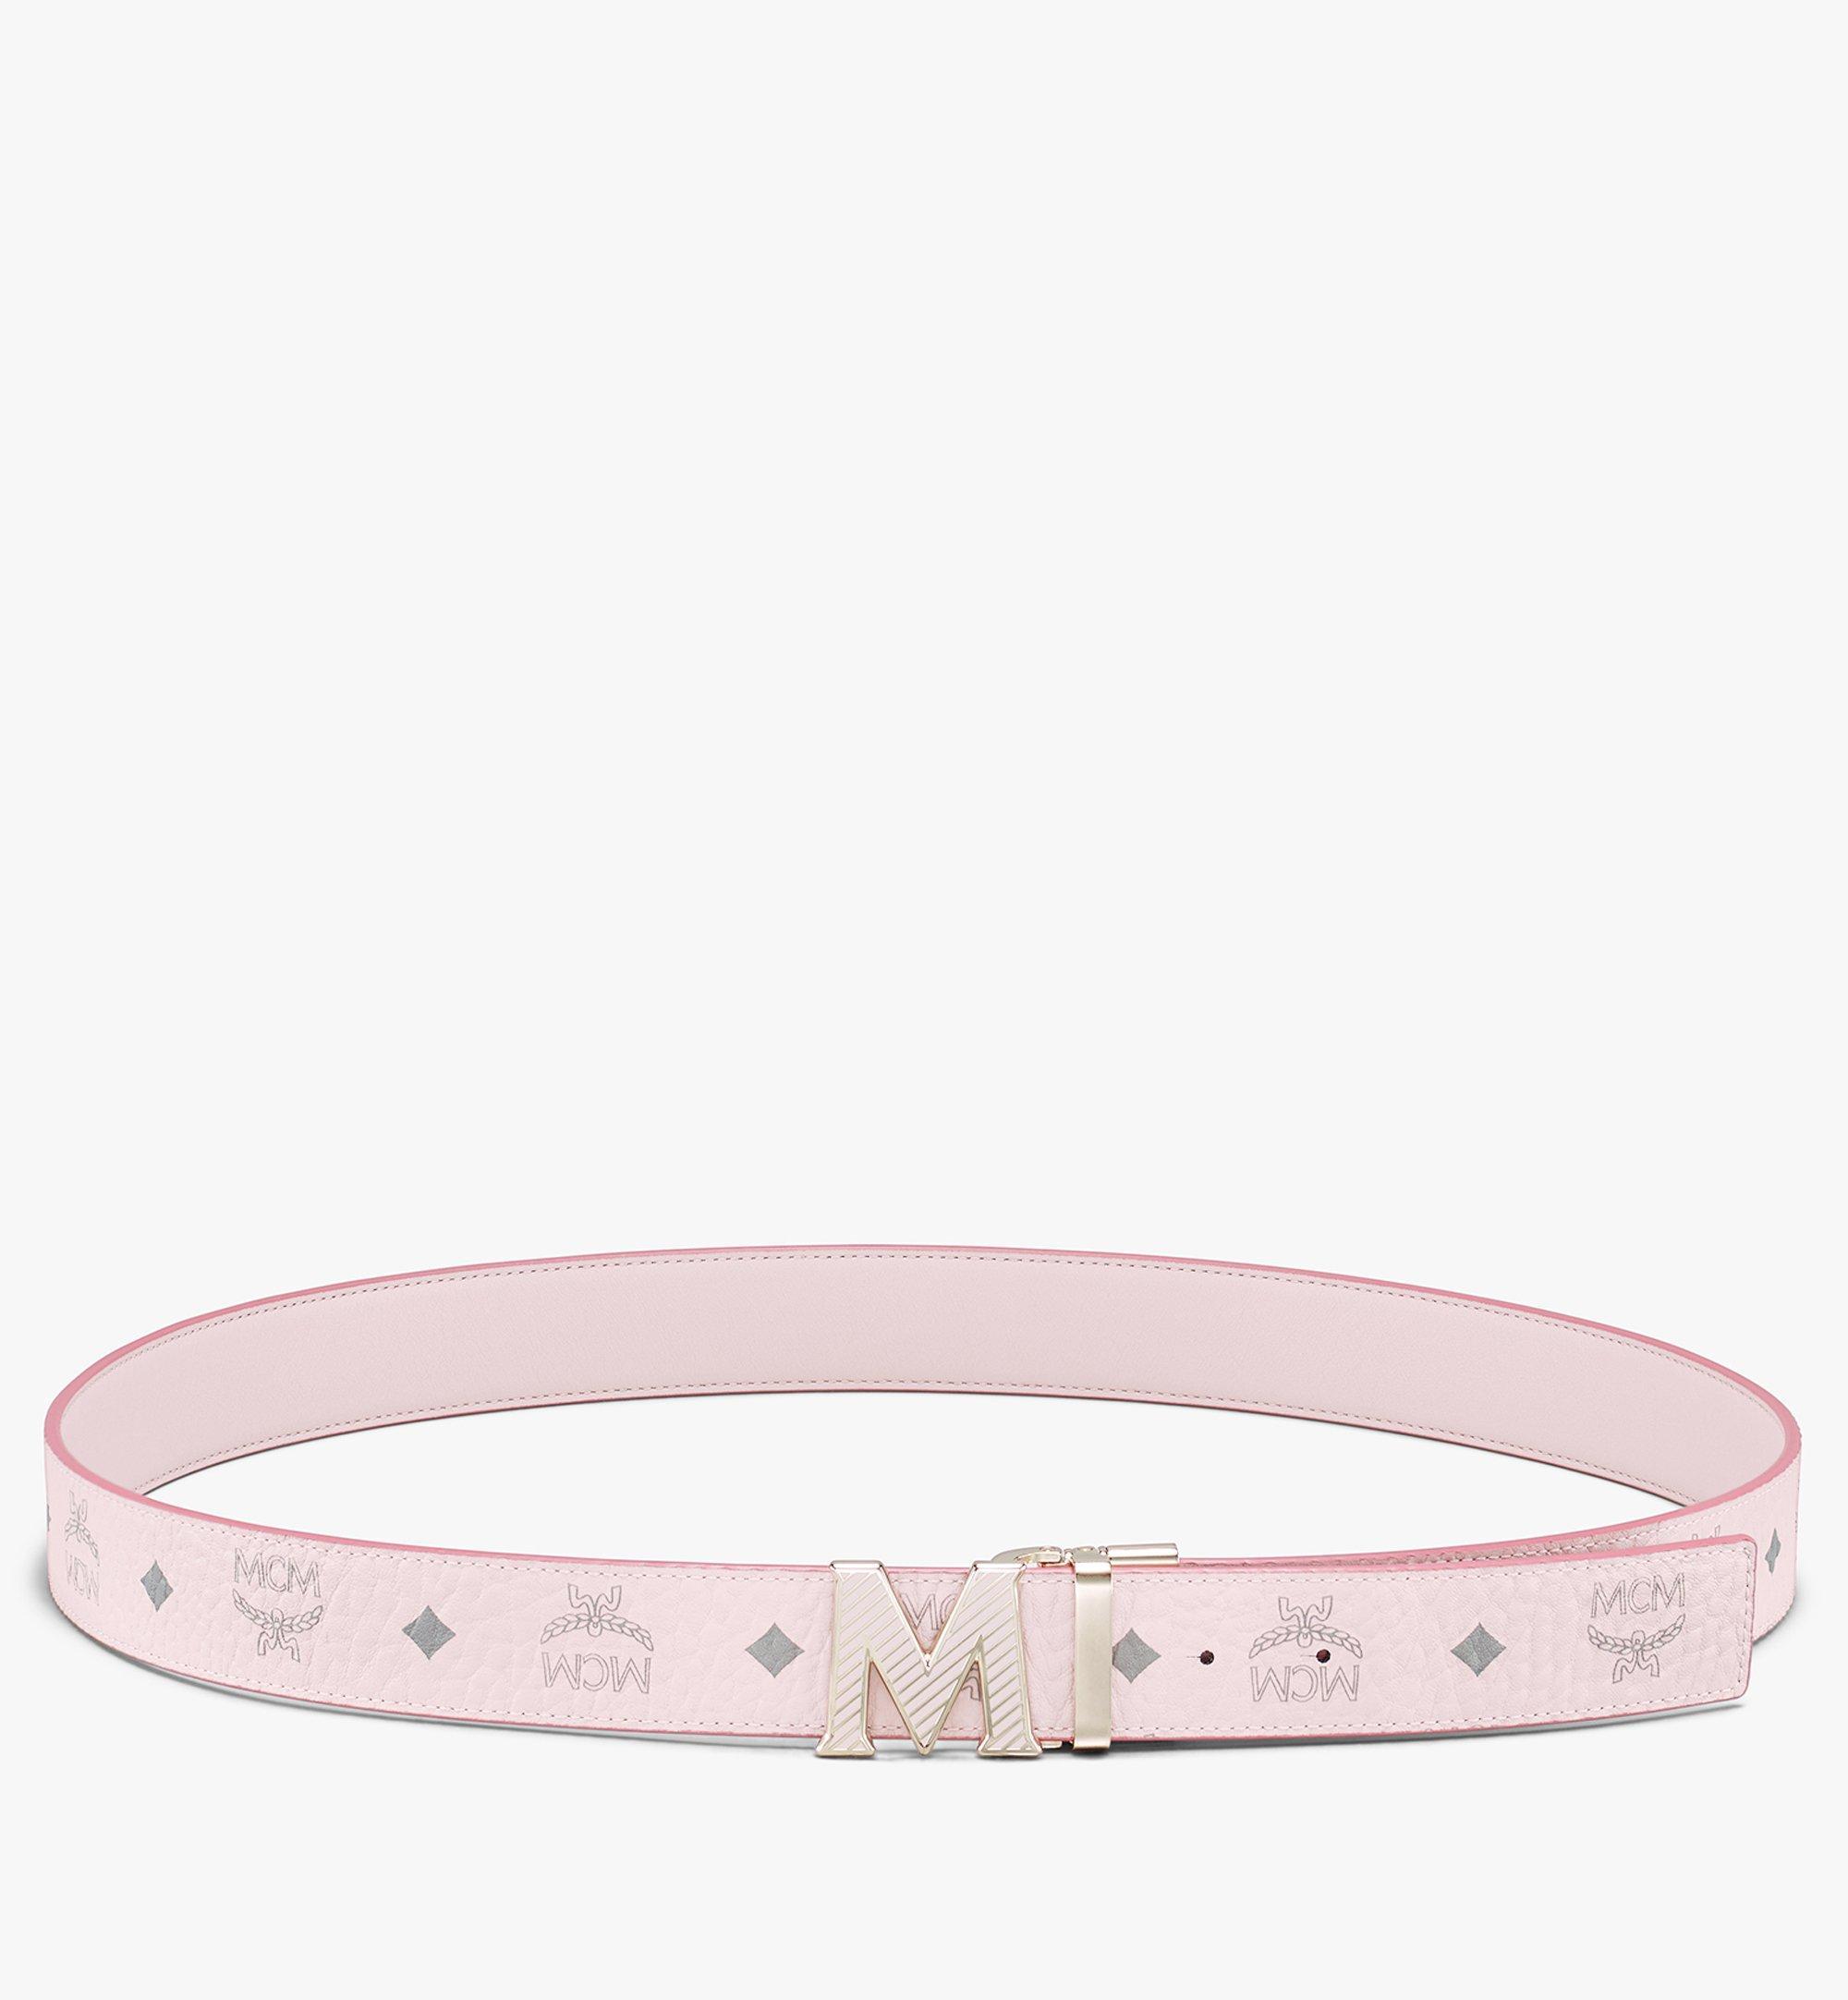 MCM Visetos皮革 Claus Oblique M 1.5 吋可翻轉使用皮帶 Pink MXBASVI20QH001 更多視圖 2